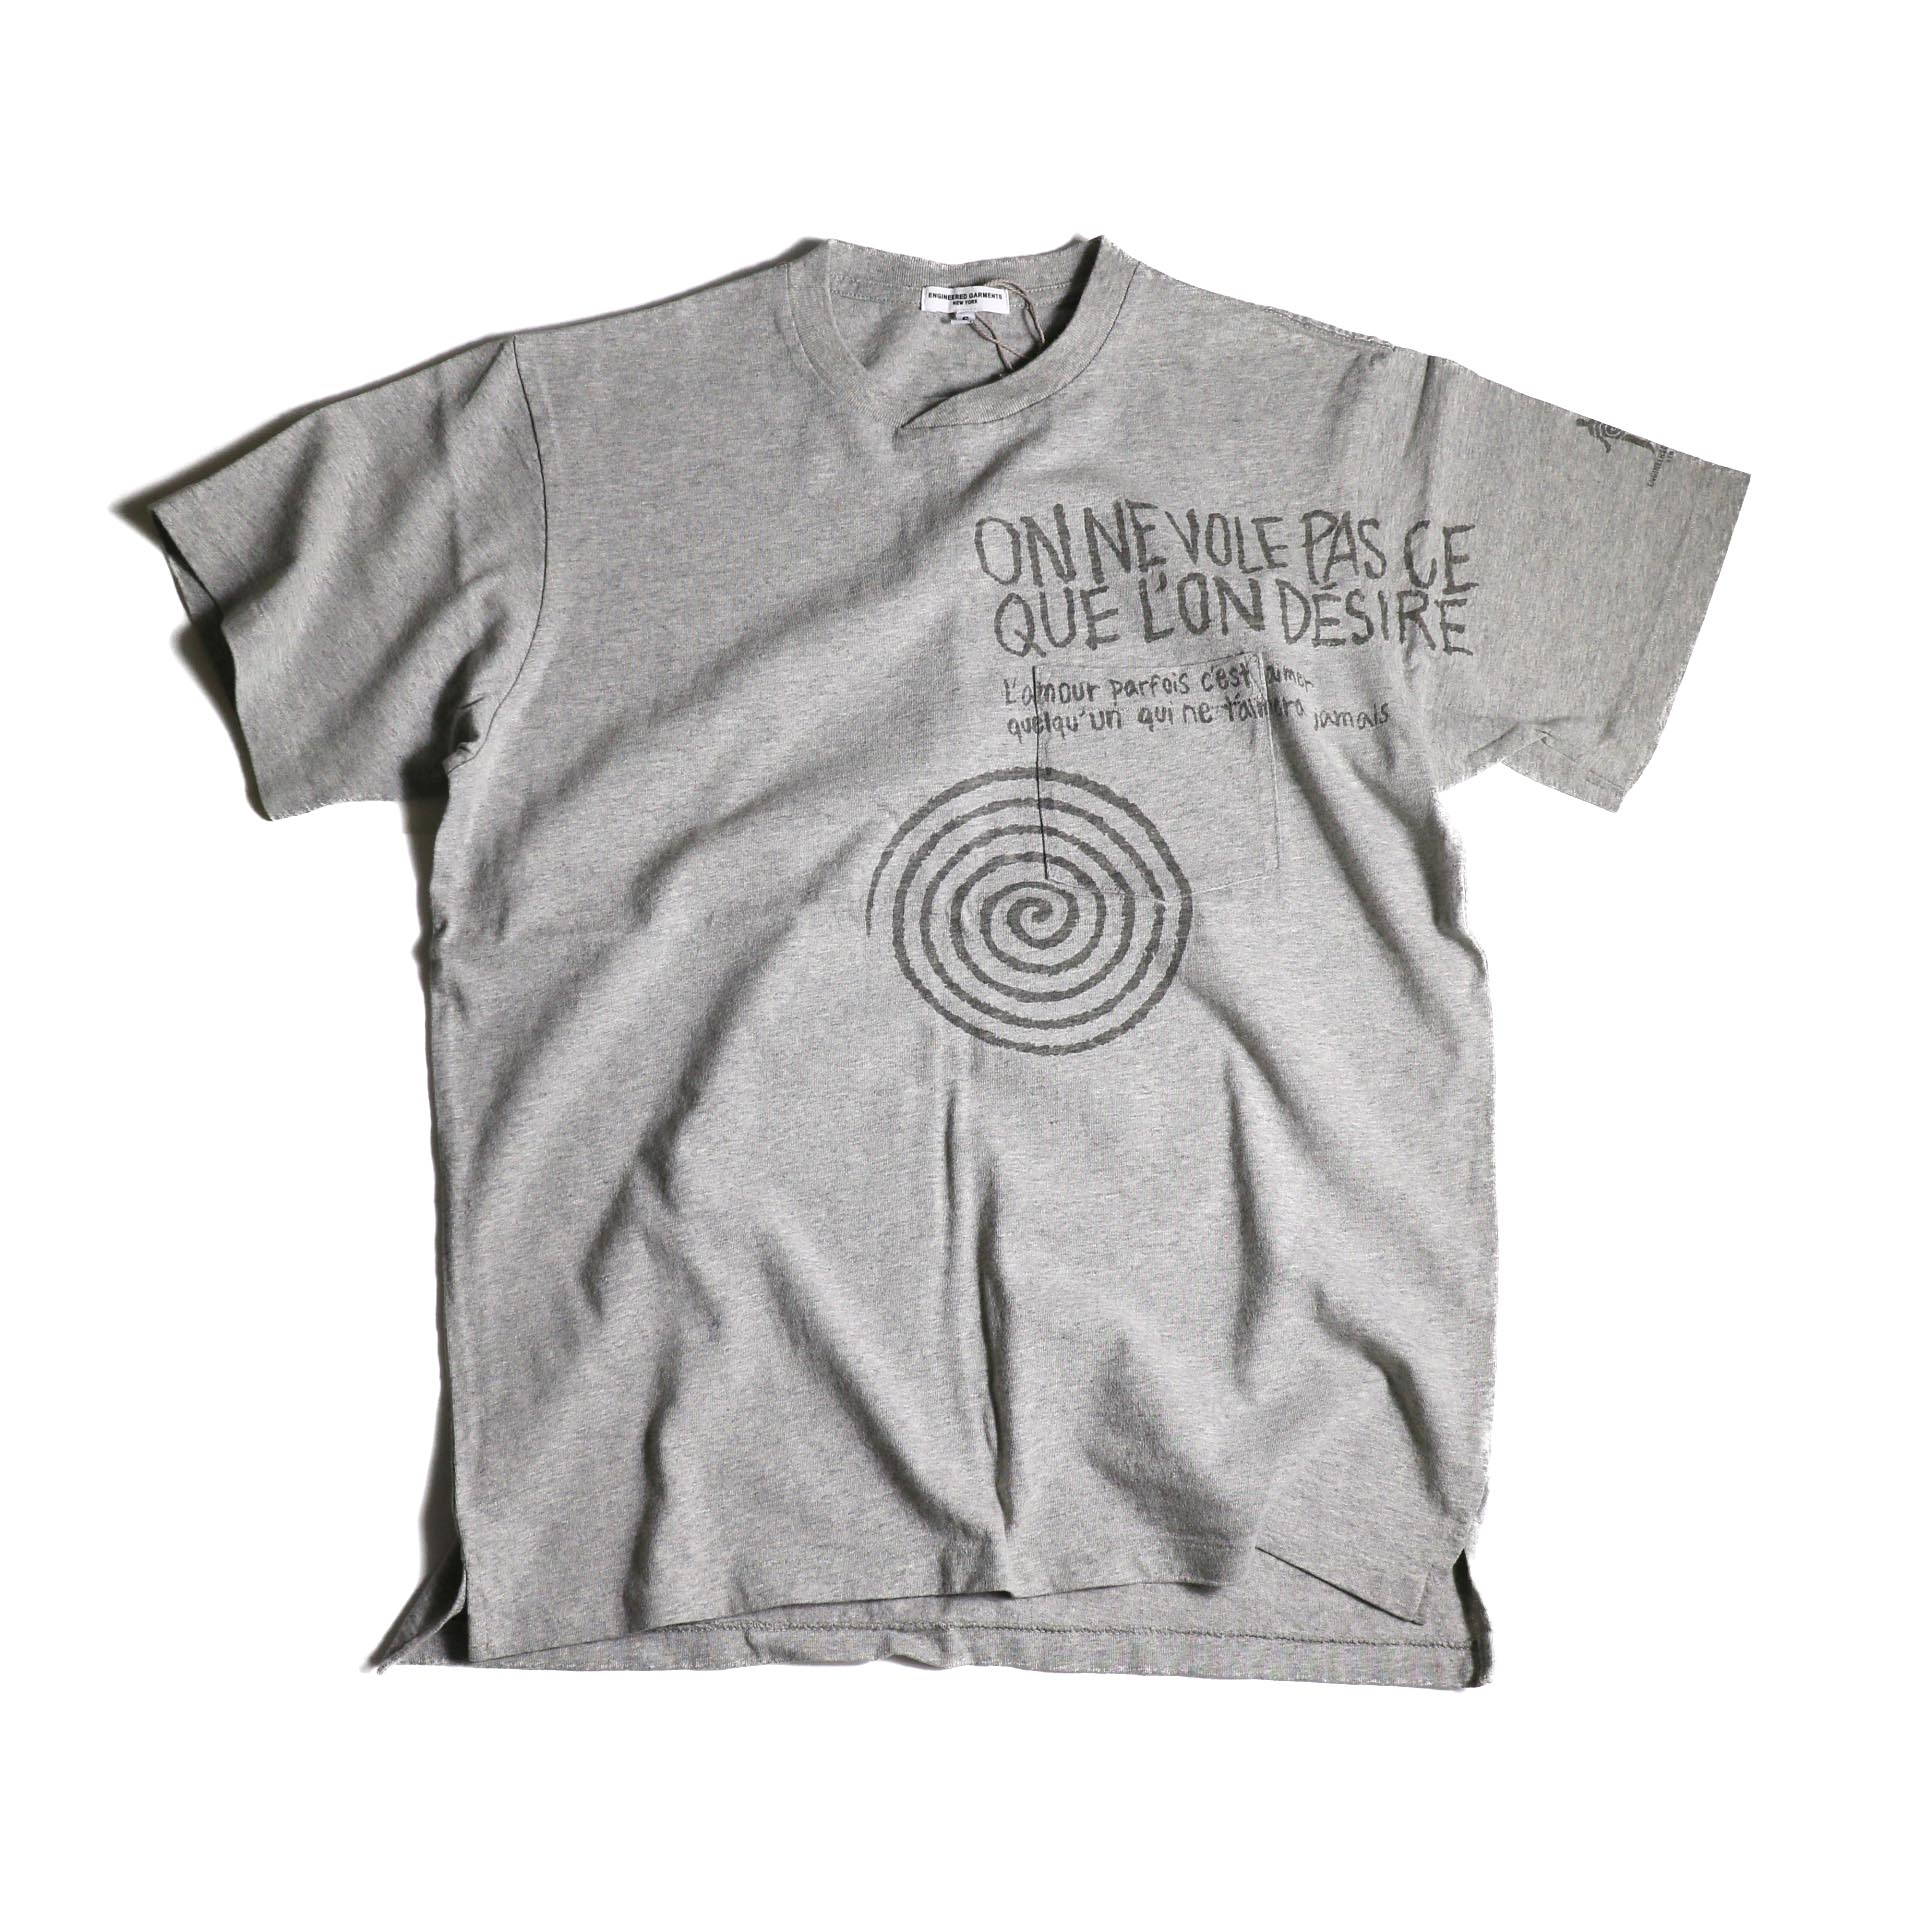 Engineered Garments / Printed Cross Crew Neck T-shirt -Spiral (Grey)